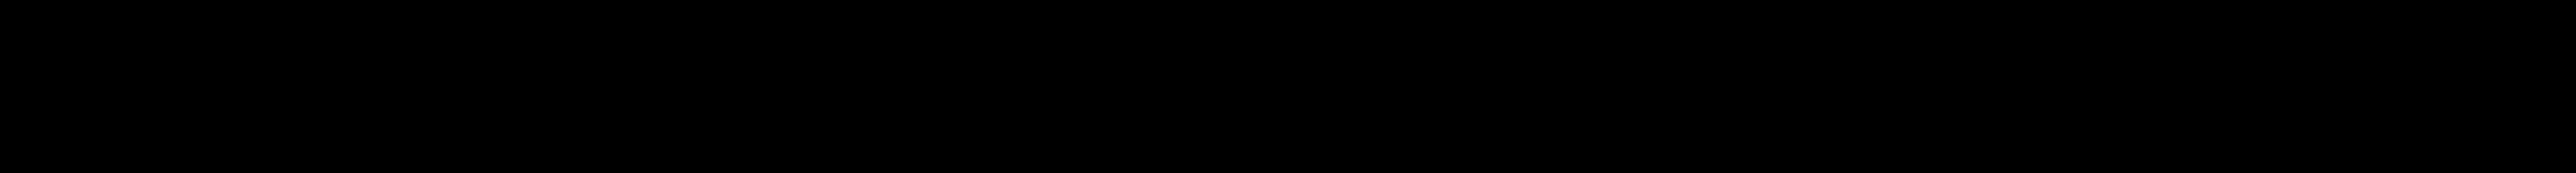 Sánchez Condensed Extra Light Italic